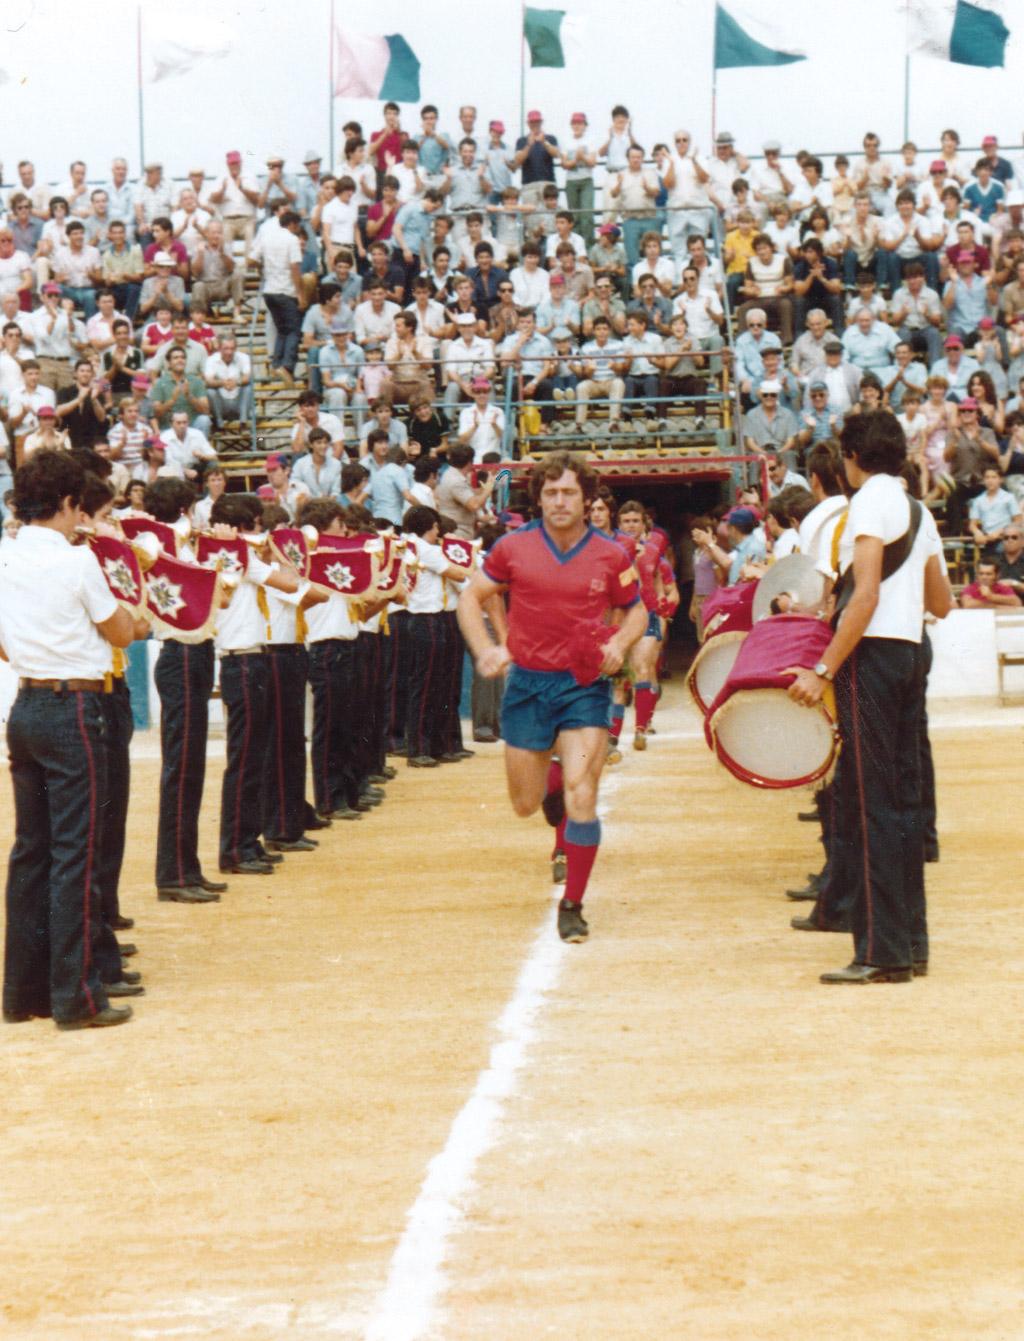 Manolo Calahorro